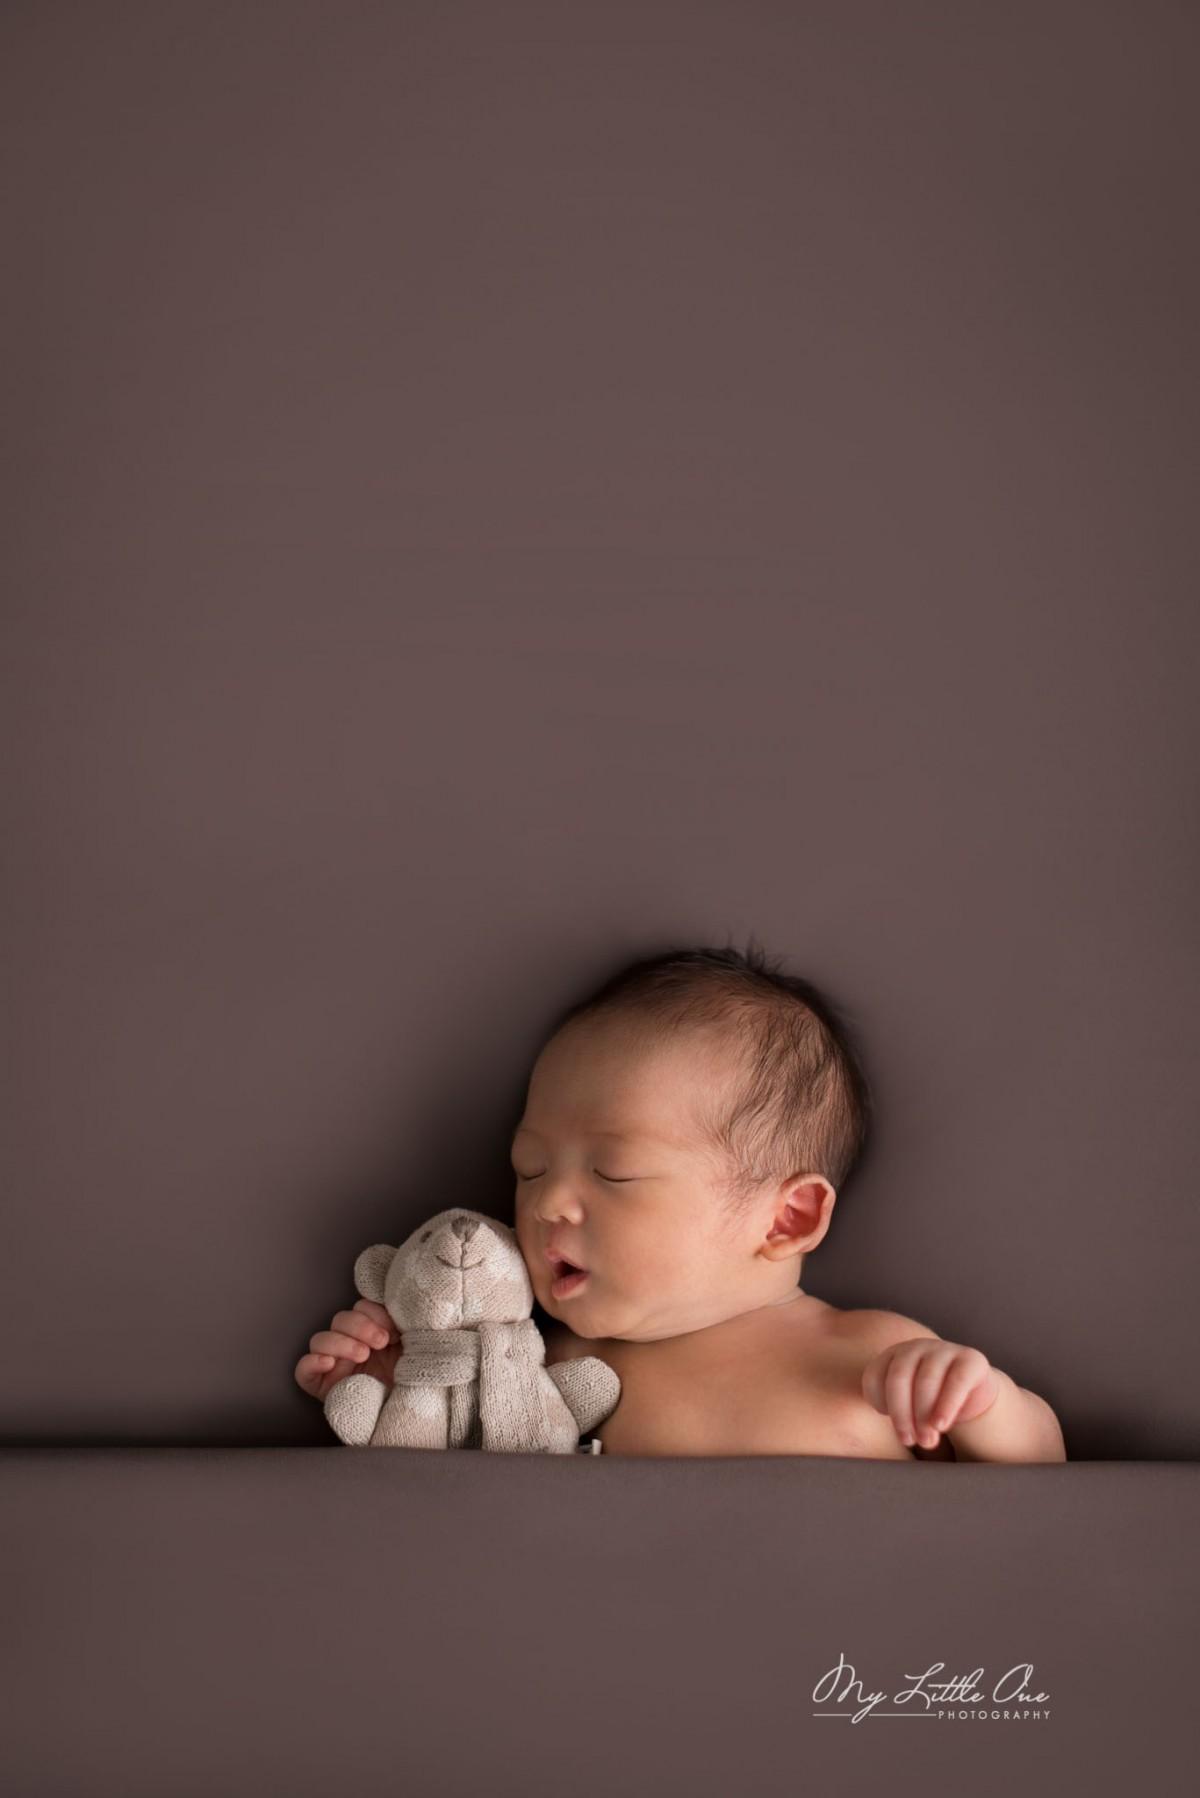 Sydney-Newborn-Photo-Dylan-08